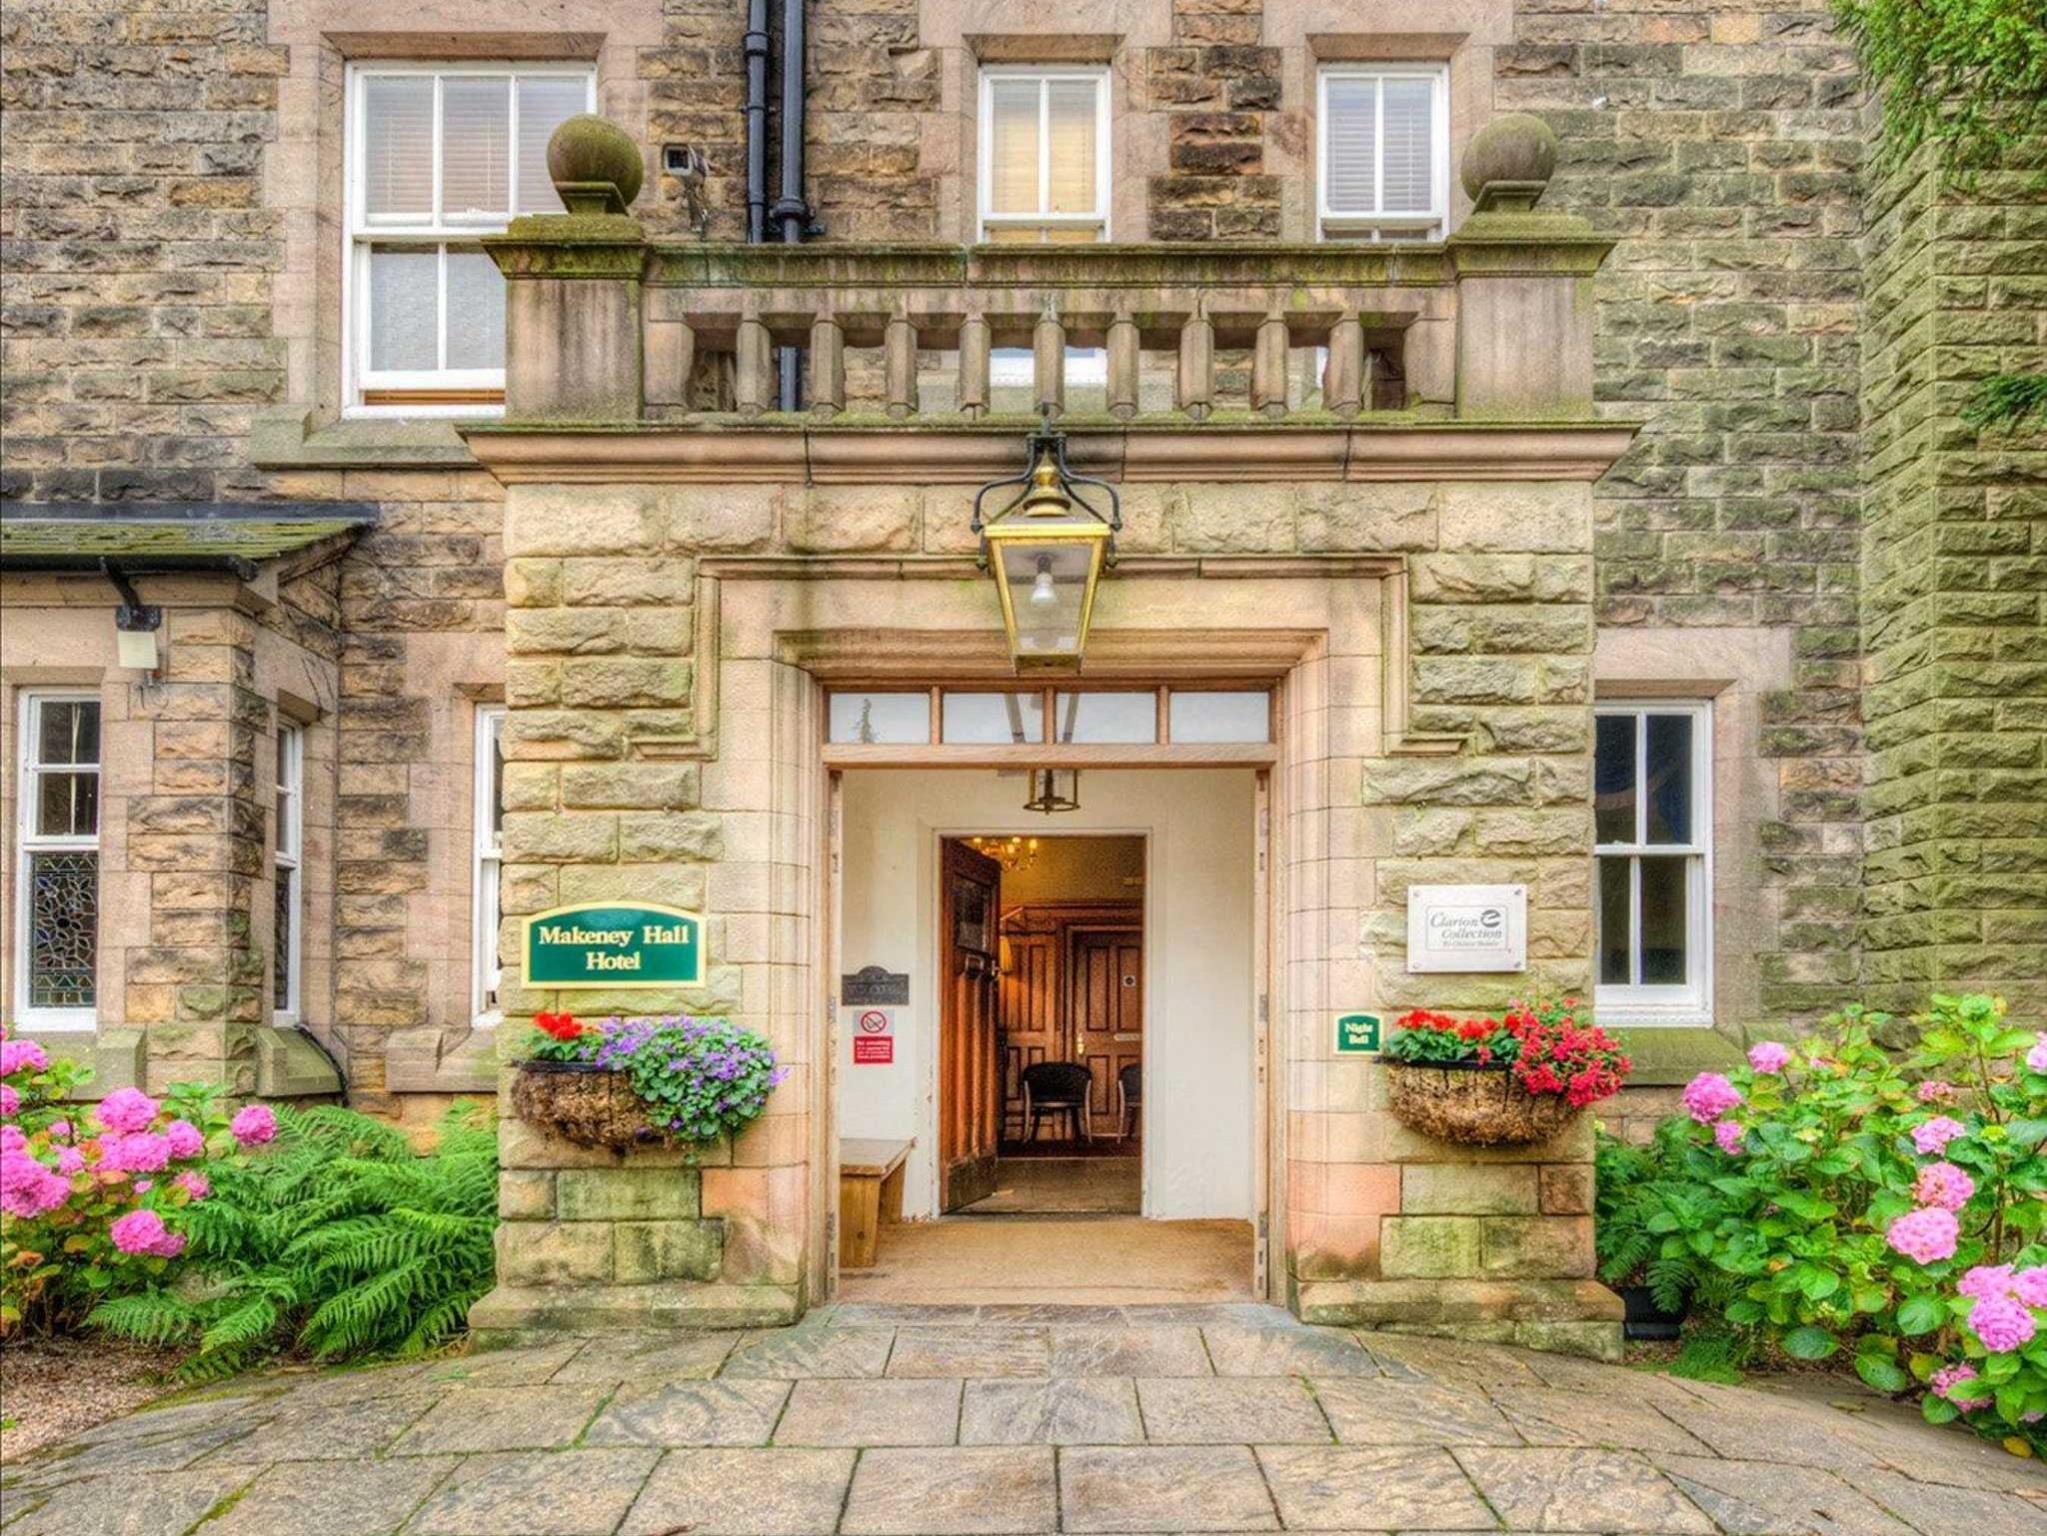 Clarion Collection Hotel Makeney Hall, Derbyshire